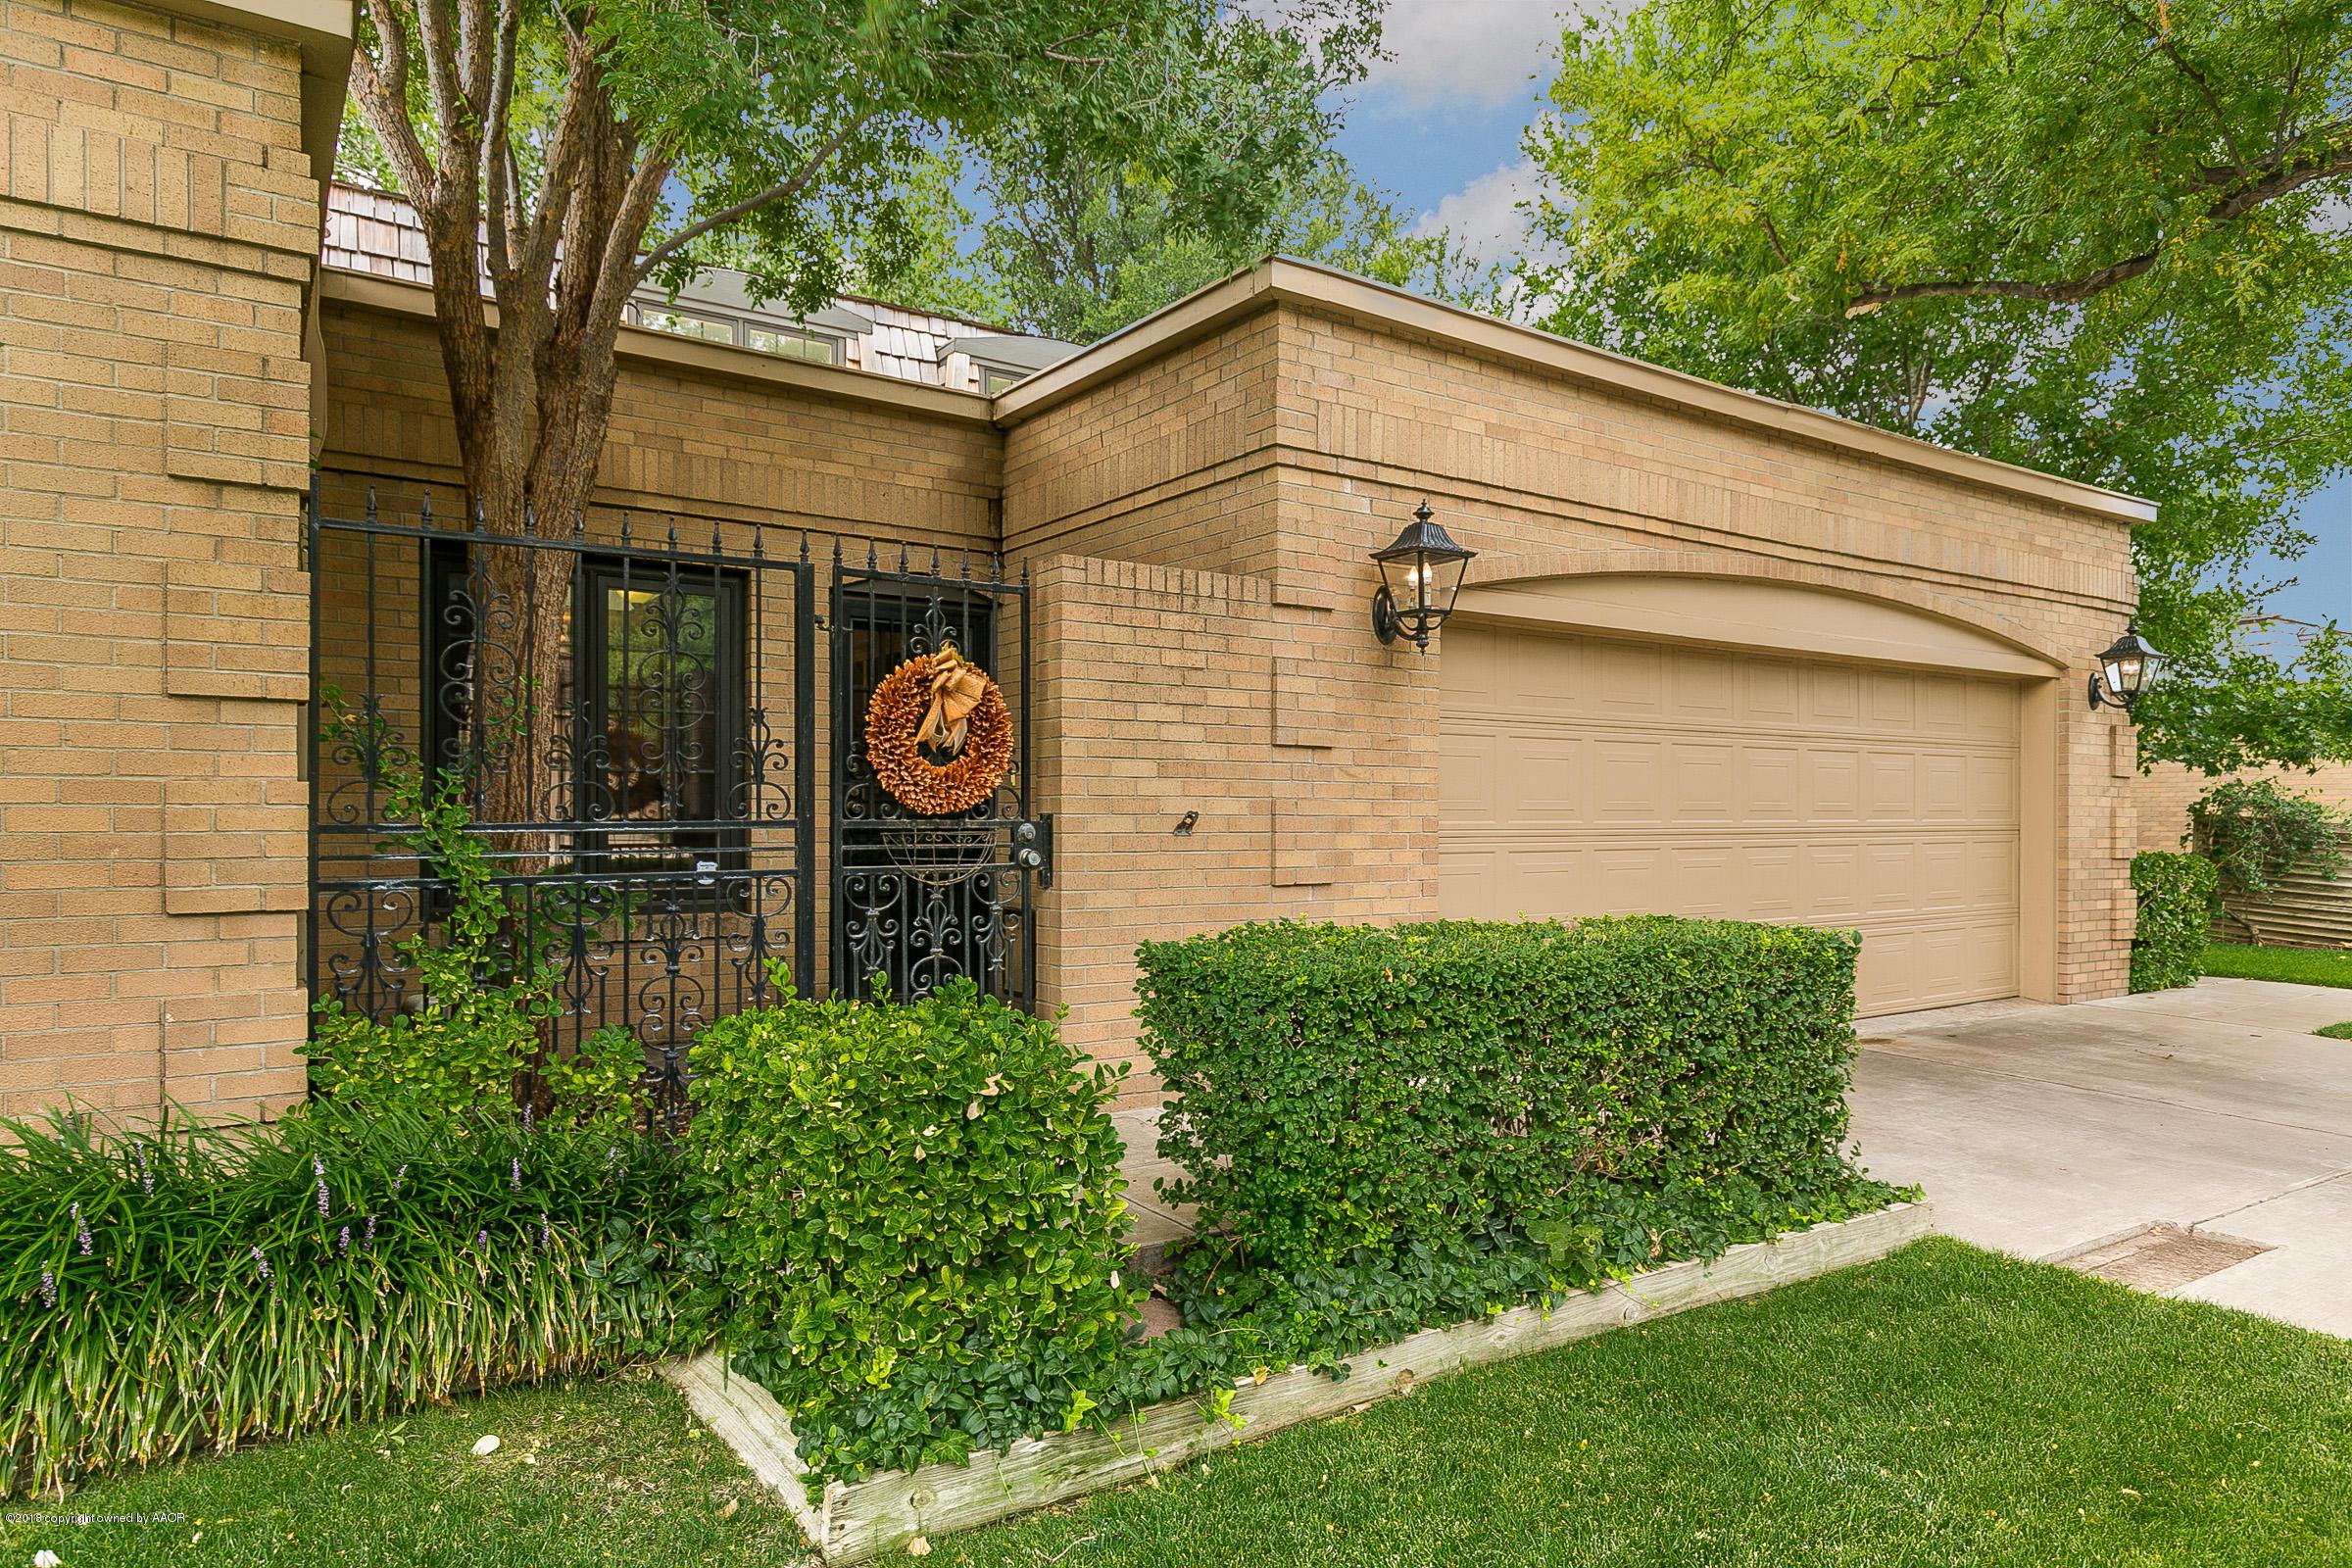 1615 S Bryan St, Amarillo, Texas